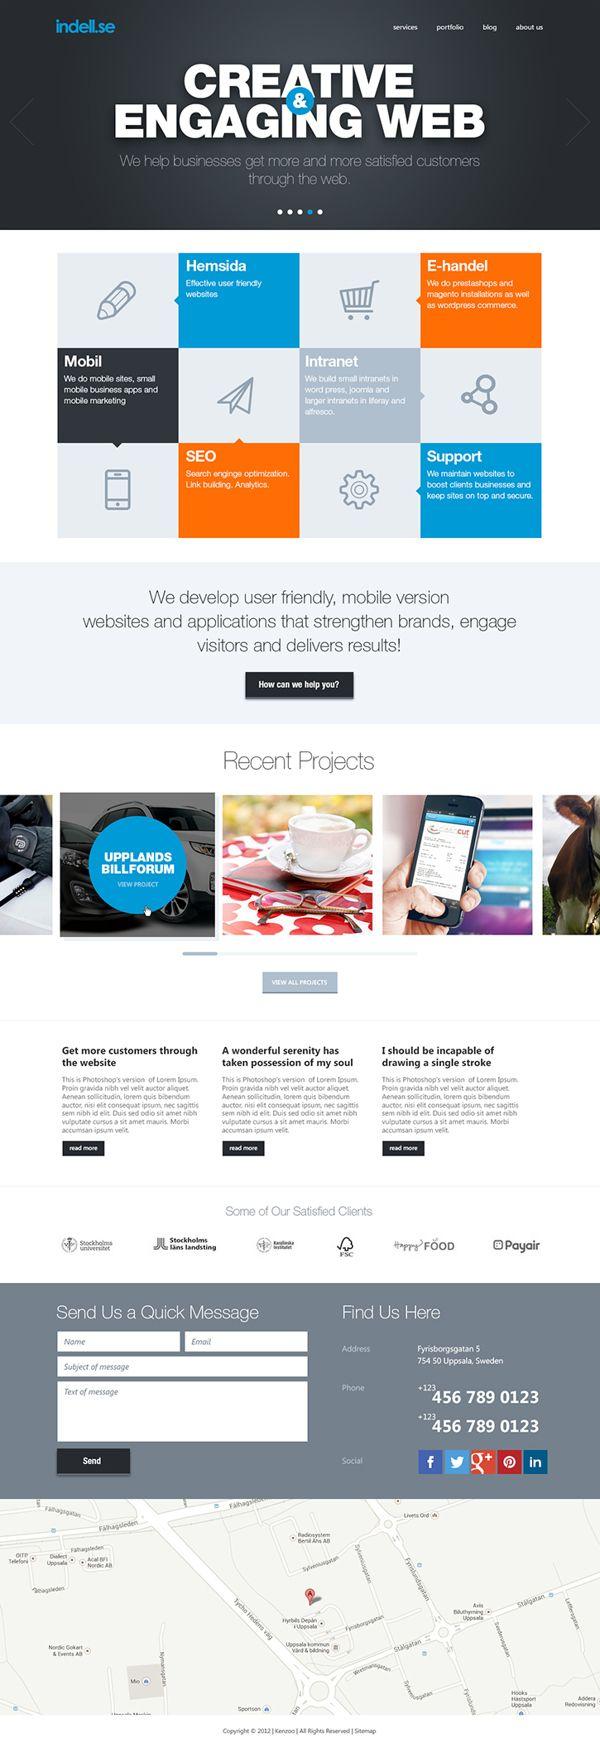 Indell Web Studio by Capcan , via Behance